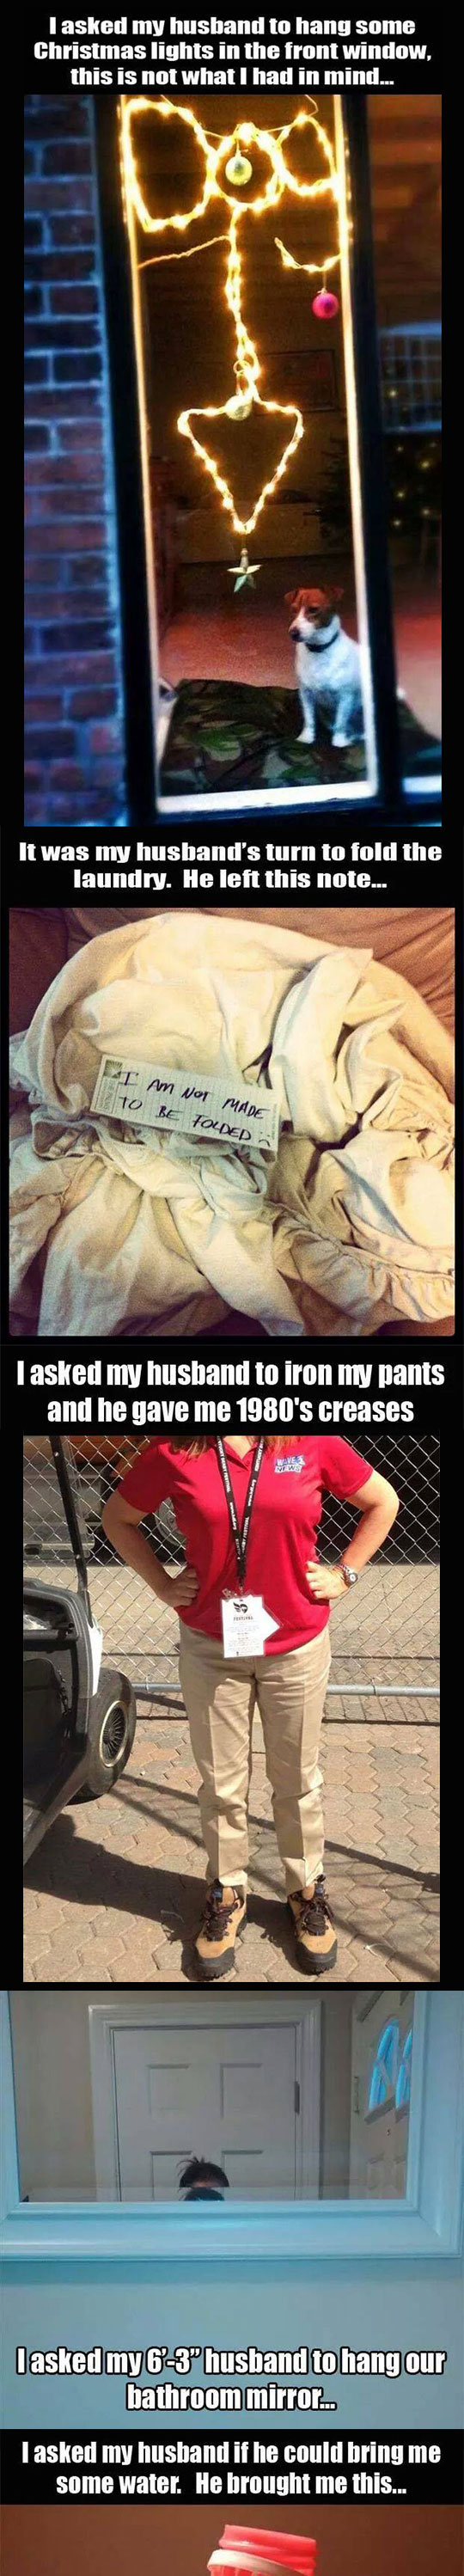 funny-husband-folding-sheets-note